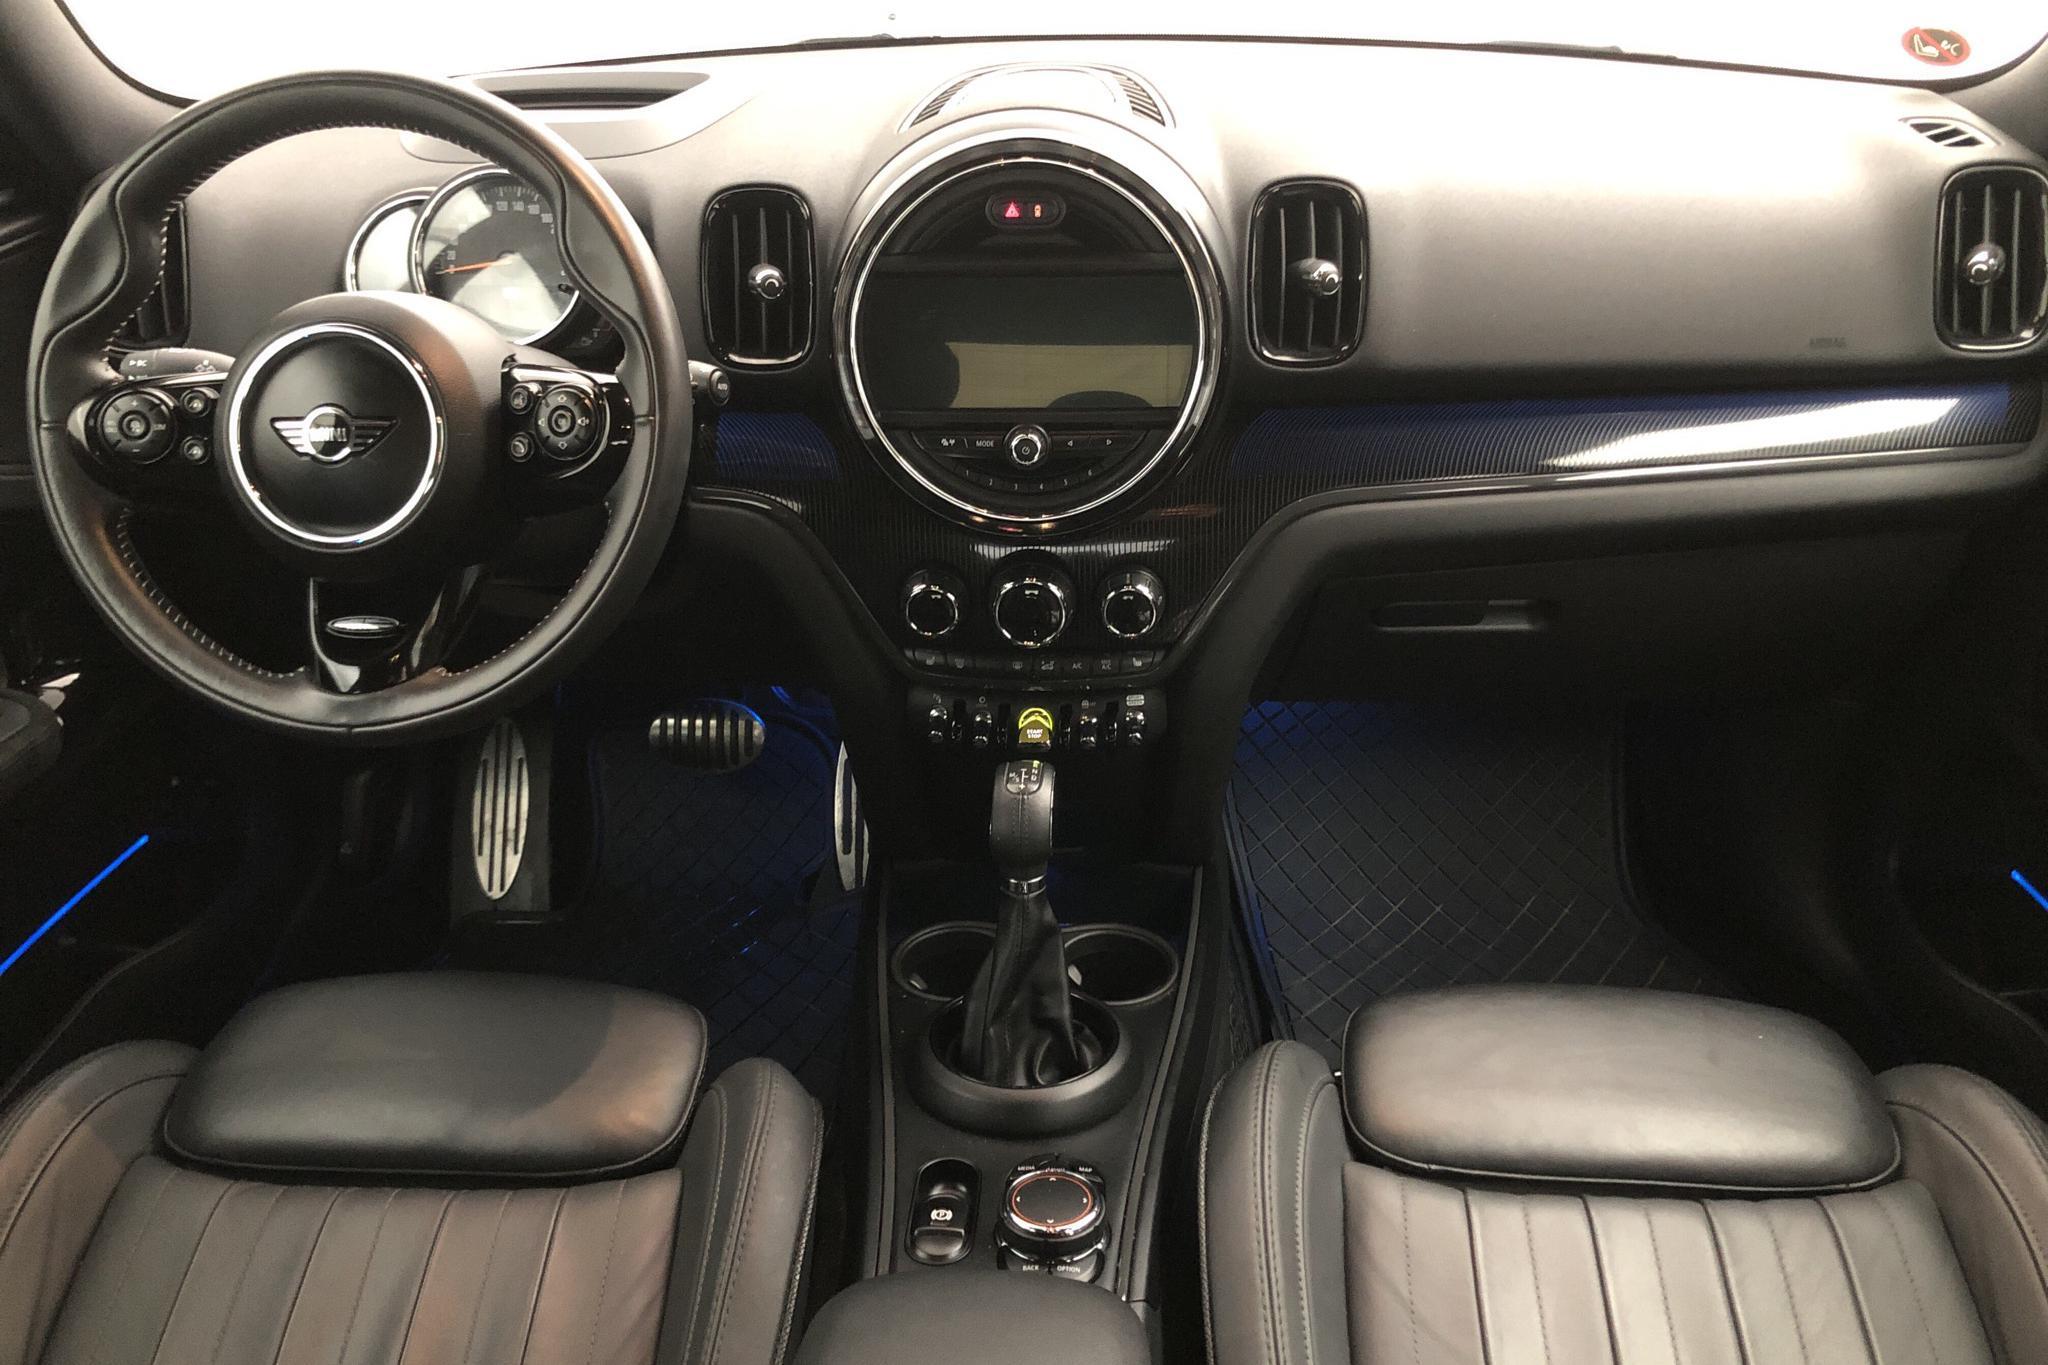 MINI Cooper S E ALL4 Countryman, F60 (224hk) - 3 221 mil - Automat - grå - 2018